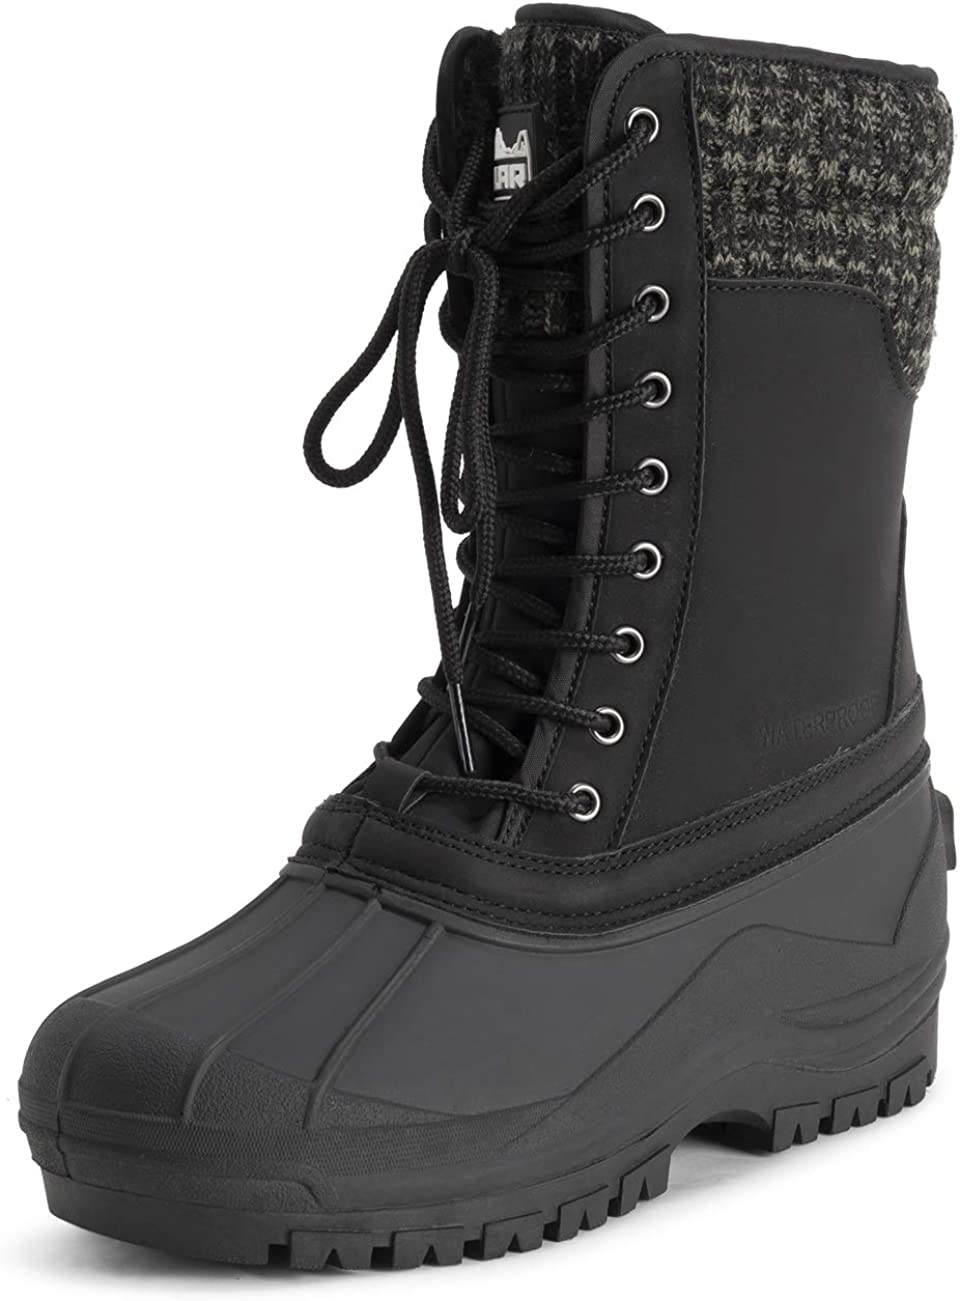 POLAR Womens Muck Lace Up Duck Snow Winter Rain Black Mid Calf Boots